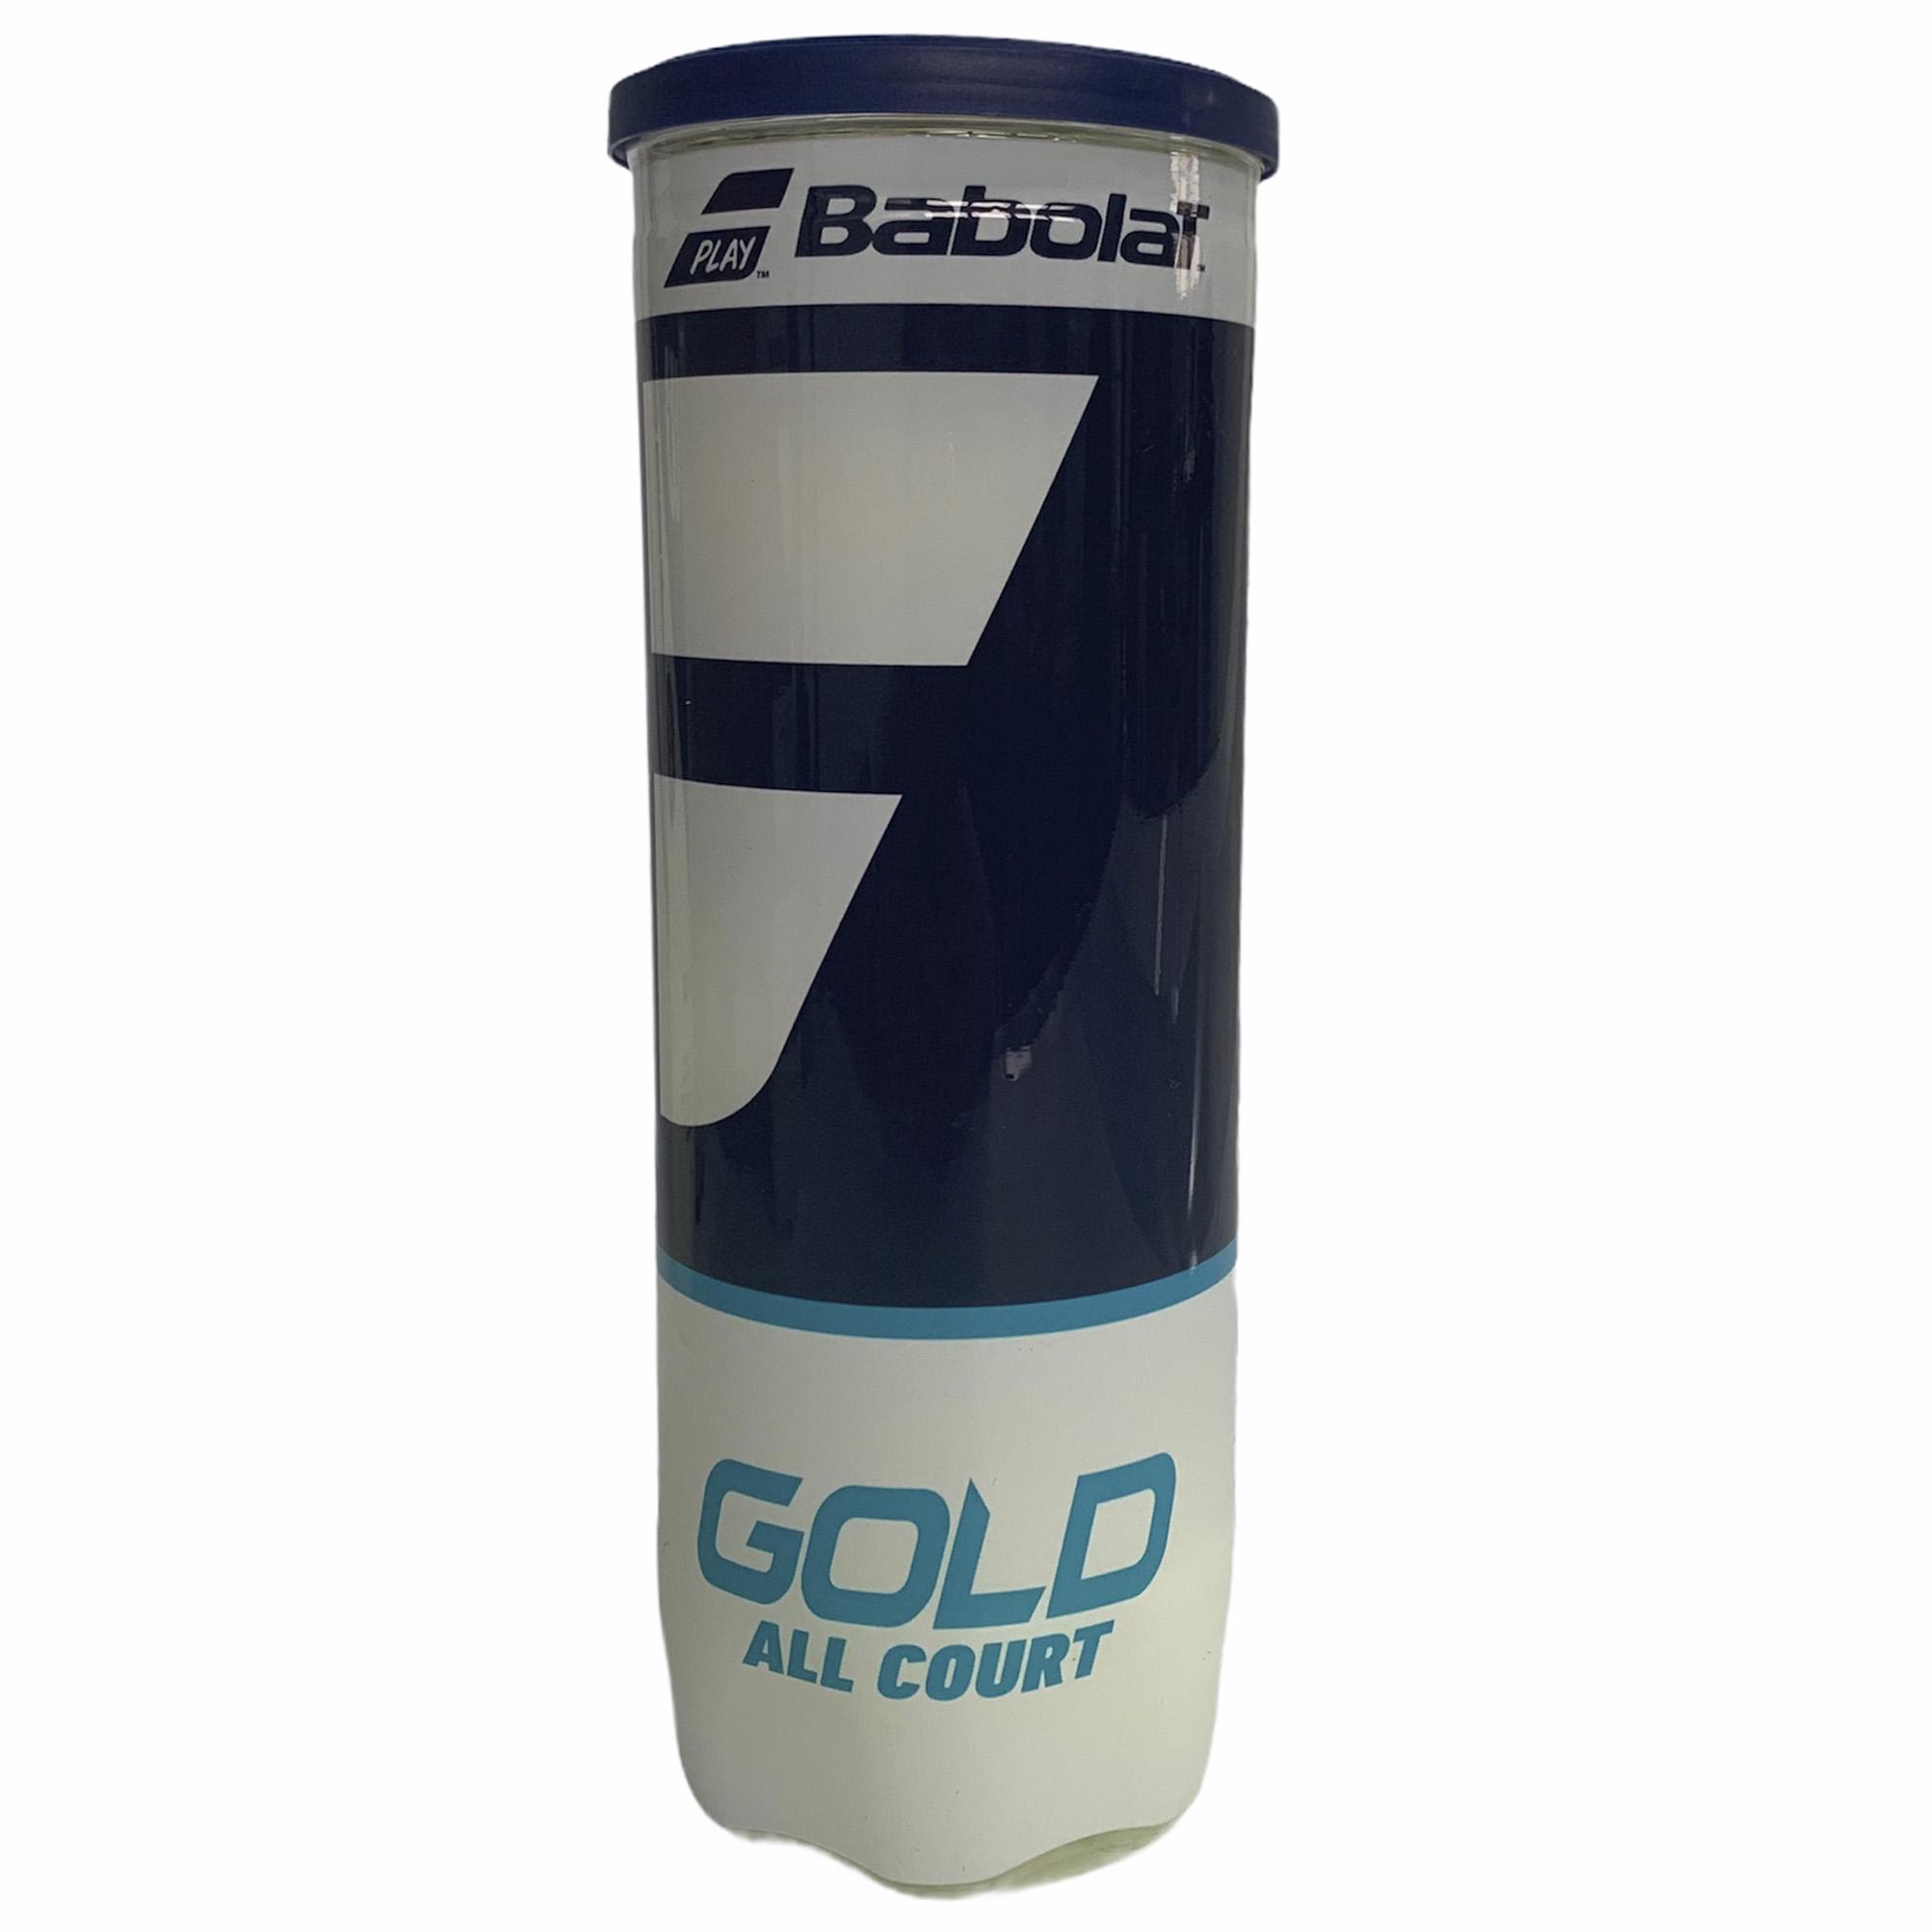 Bola de Tênis Babolat Gold All Court